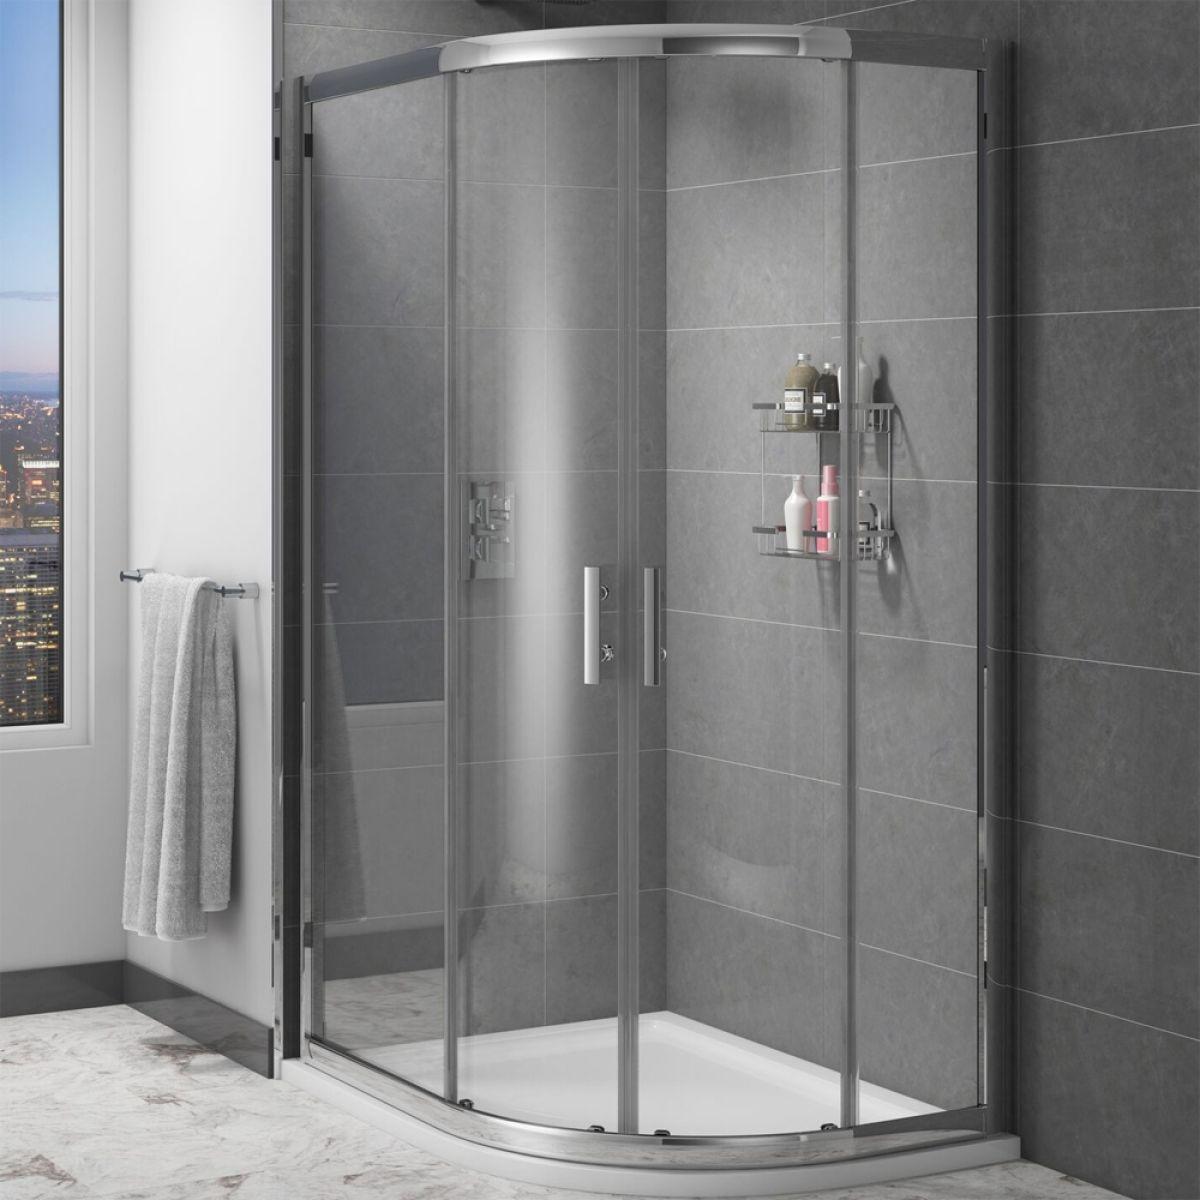 Cassellie Cass Six Offset Quadrant Shower Enclosure